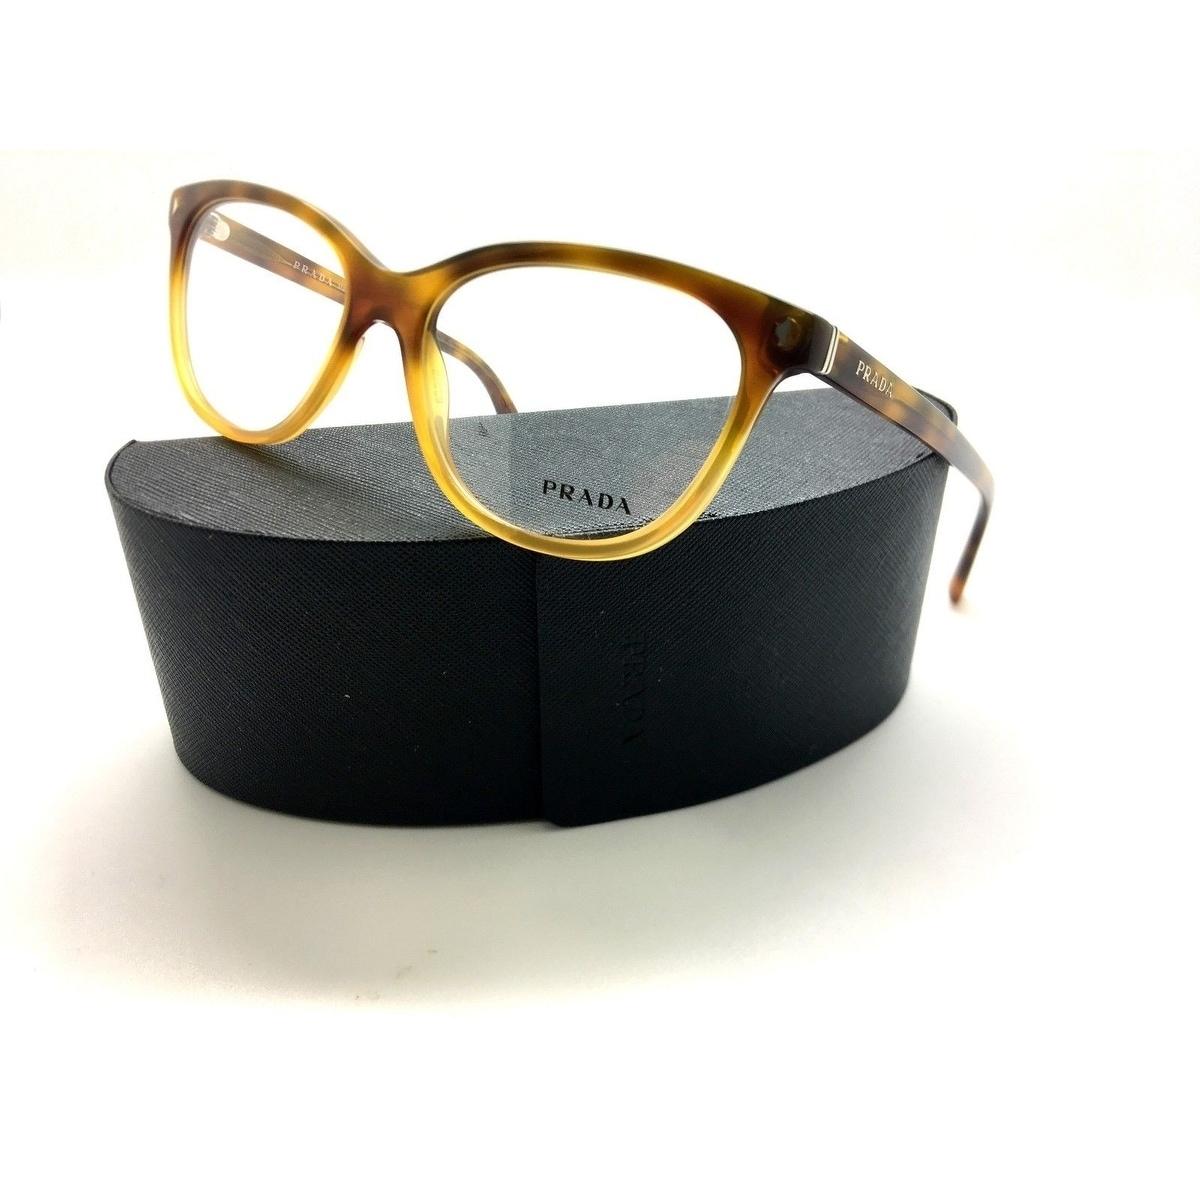 2b2694e03a52 Shop Prada VPR 14R TKU-1O1 Light Havana Authentic Eyeglasses 52mm w/Case -  Free Shipping Today - Overstock - 23106500